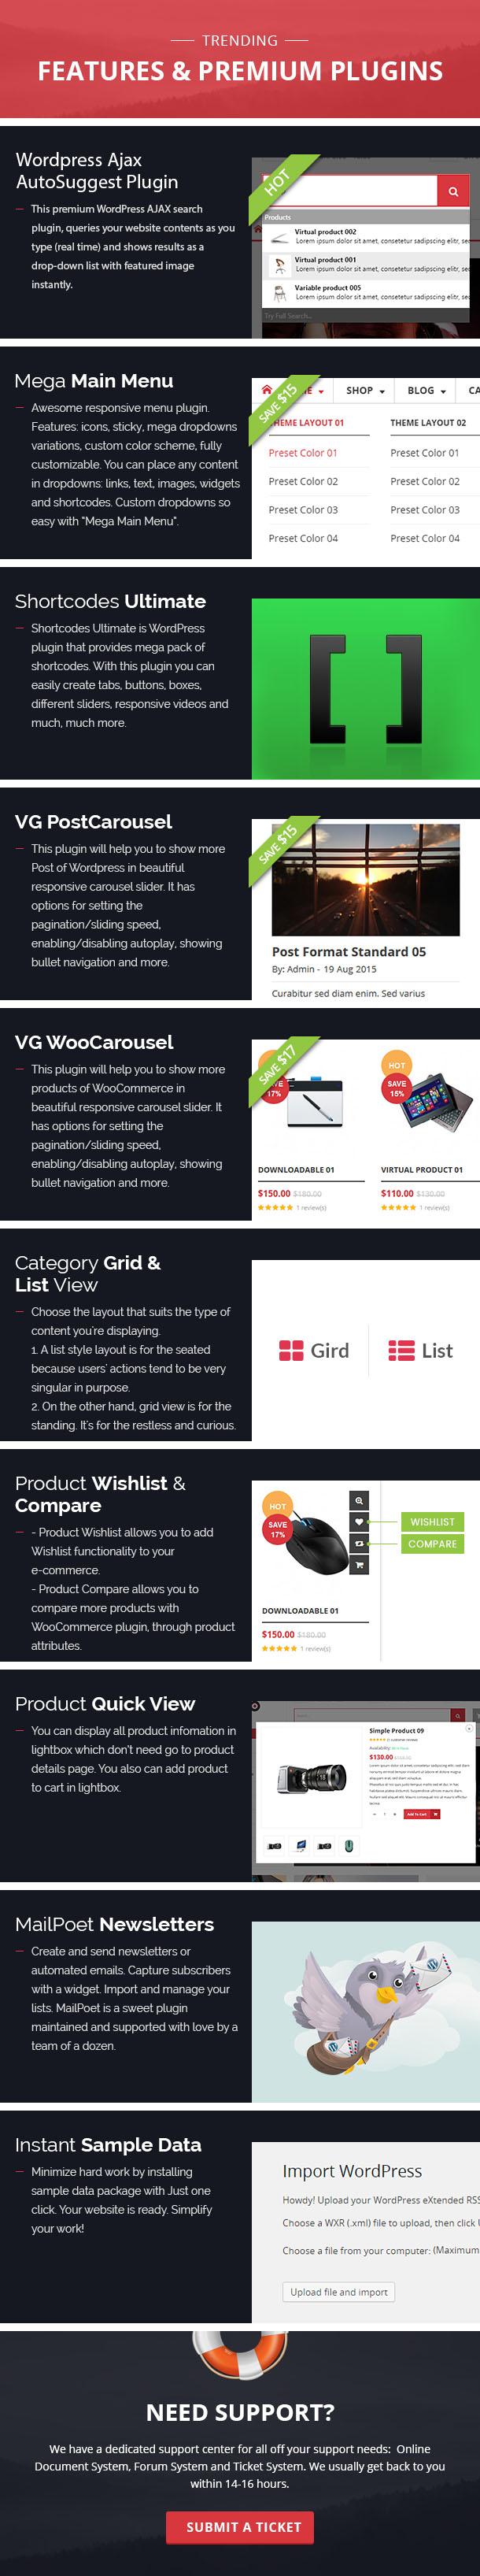 VG Galio - Mega Shop Responsive WooCommerce Theme - 16